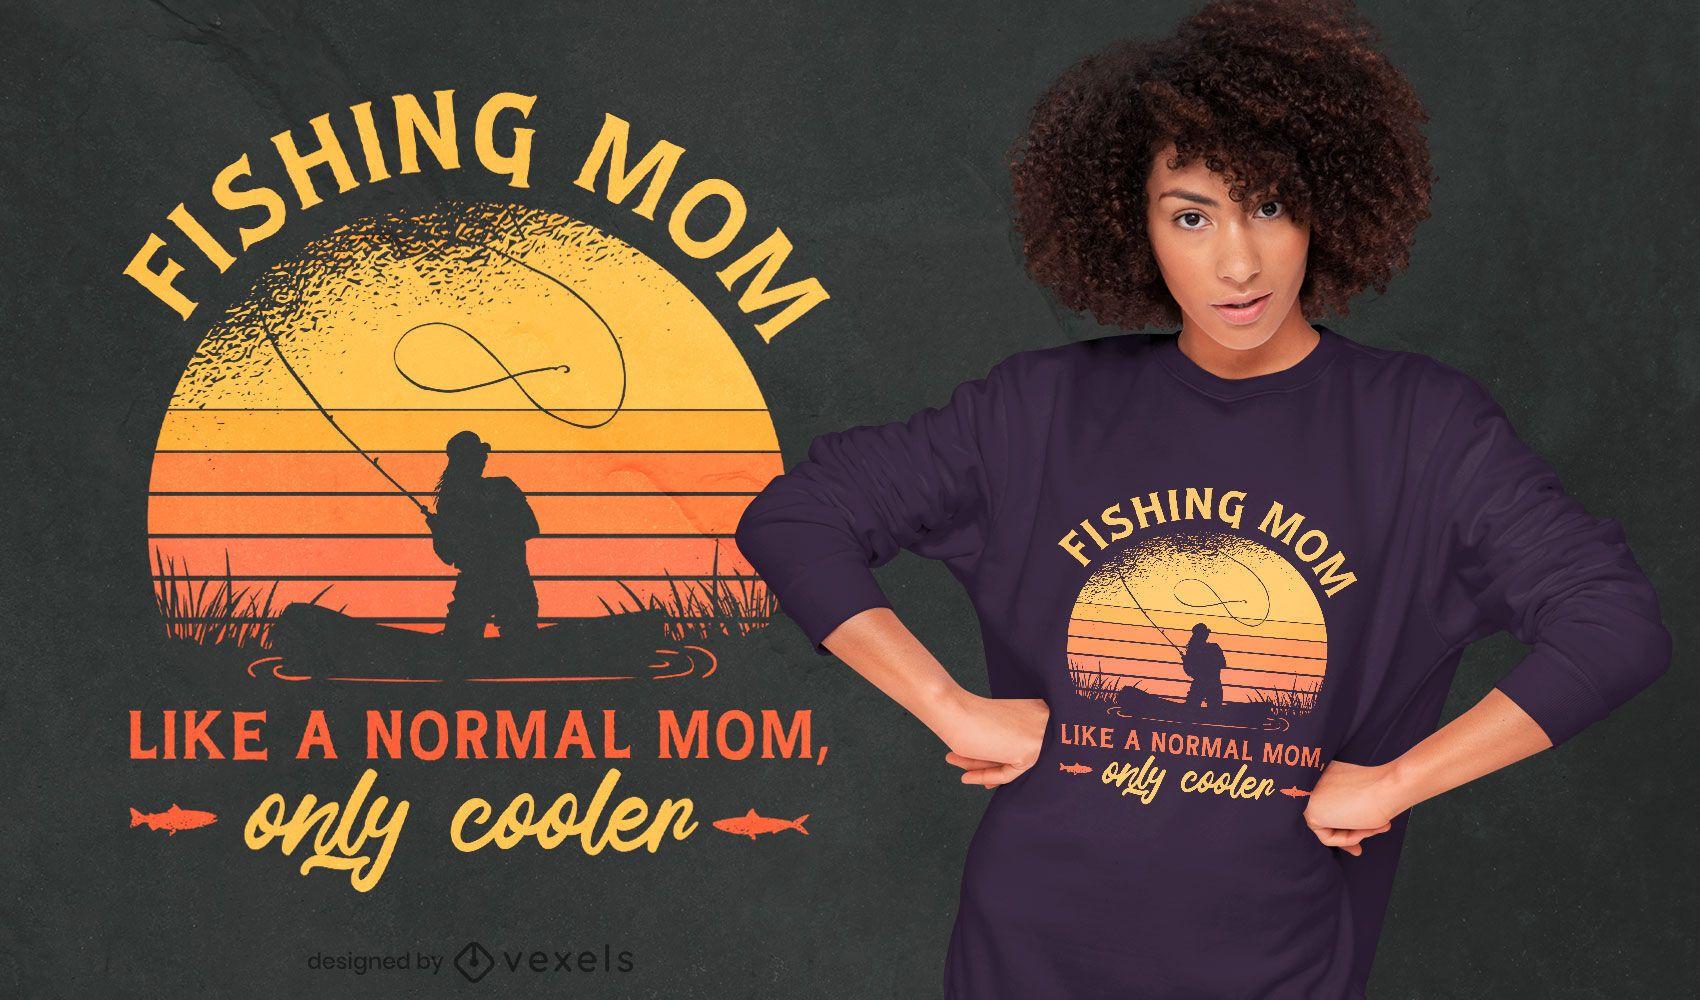 Mom fishing quote t-shirt design